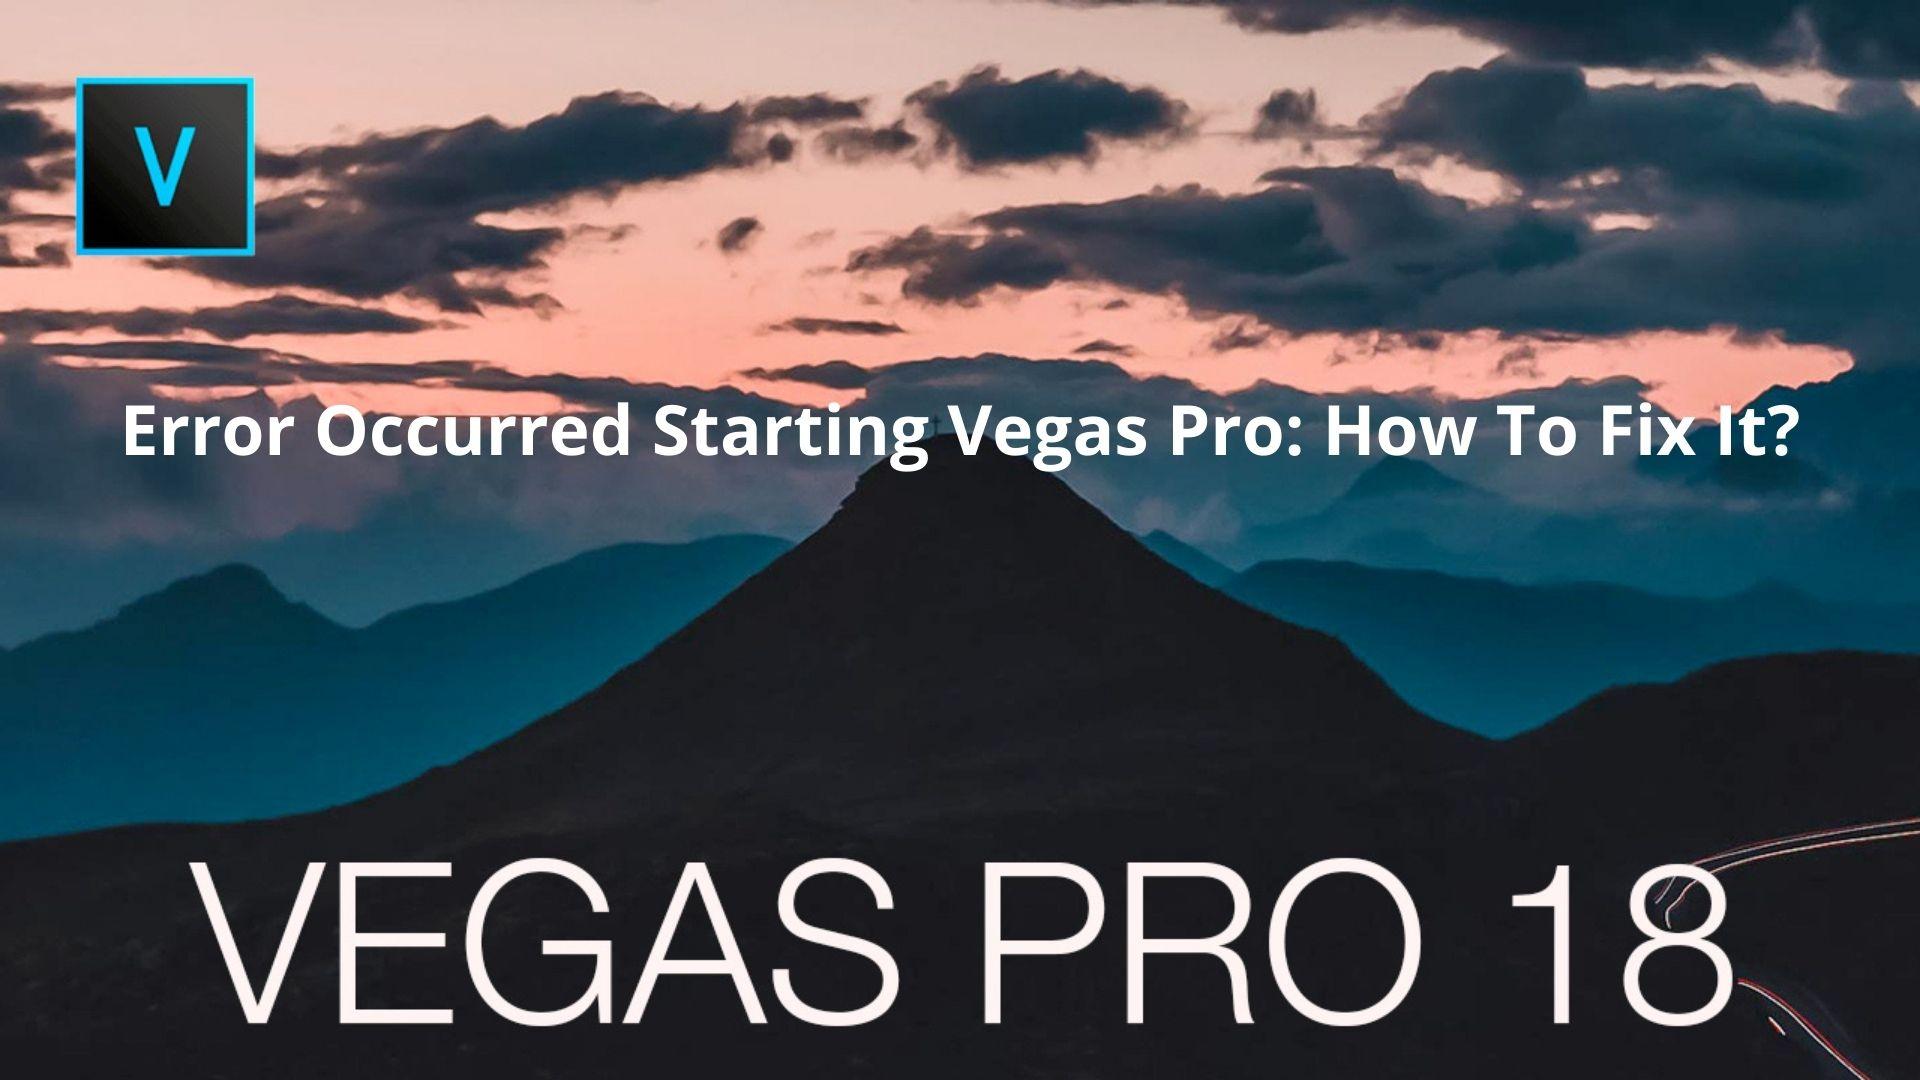 Error Occurred Starting Vegas Pro